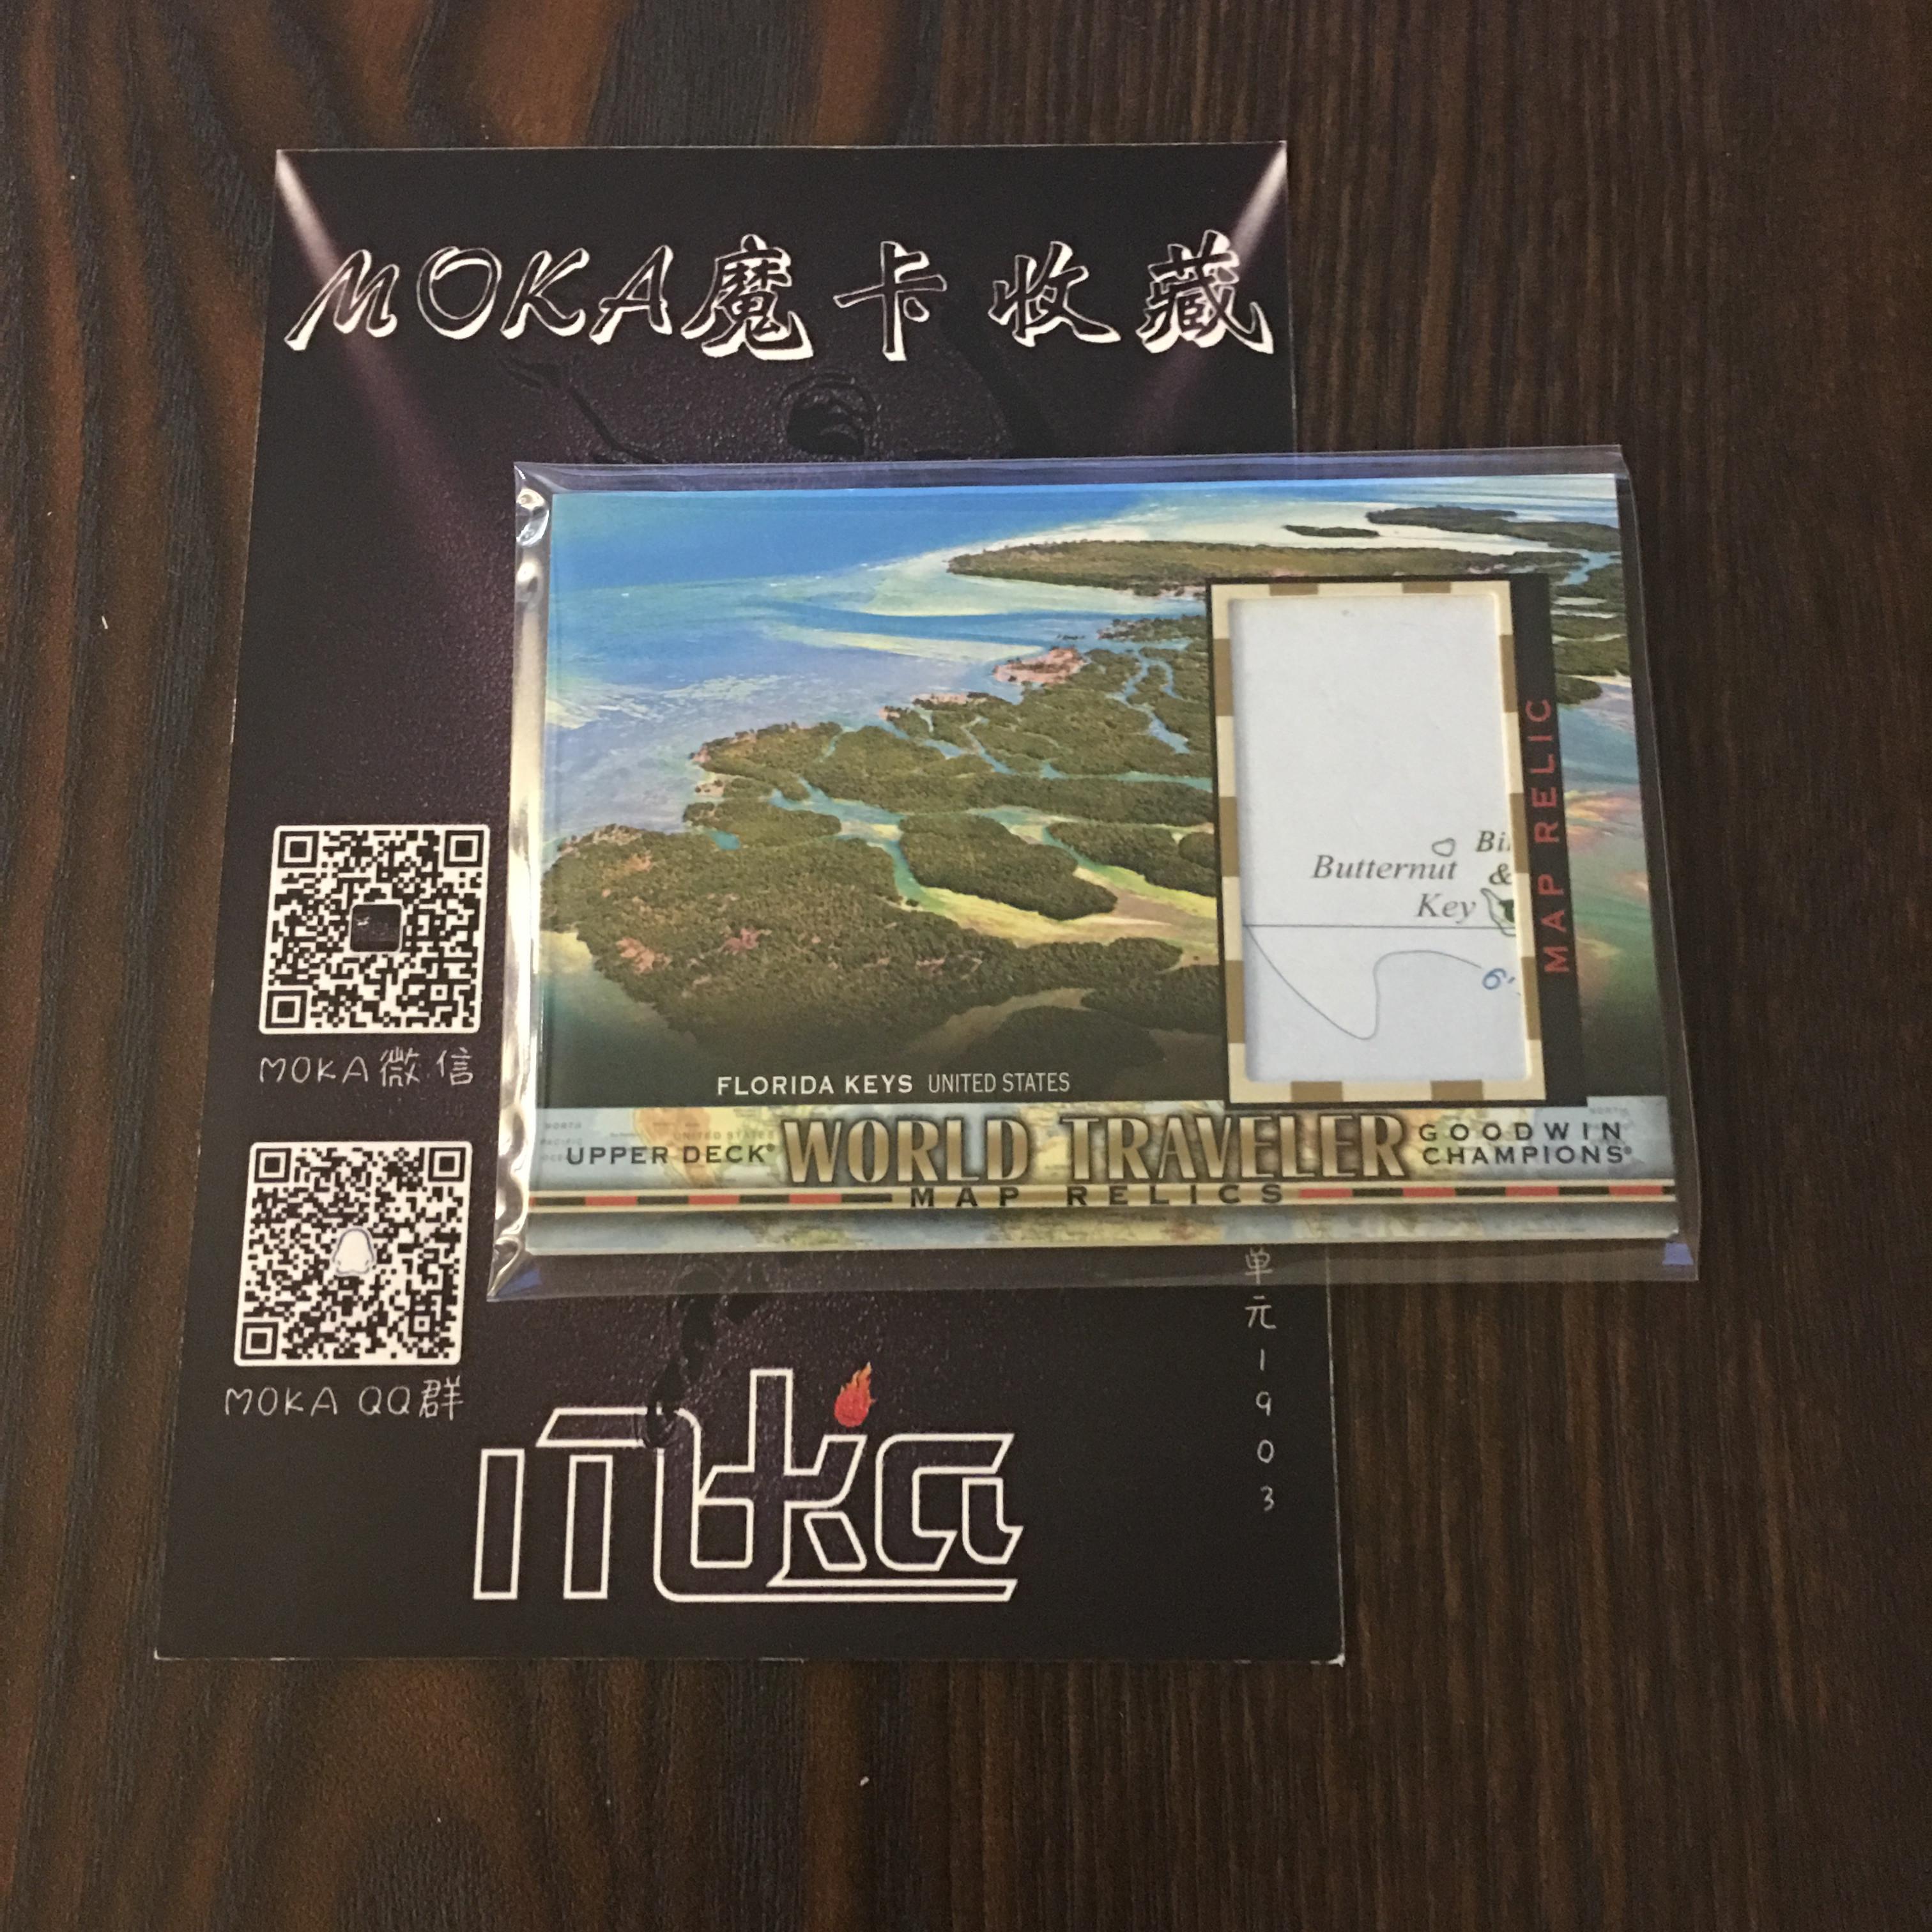 【MOKA球星卡收藏】#1804450 2018 UD Goodwin 古德温 地图卡 编号WT-81 凑套必备